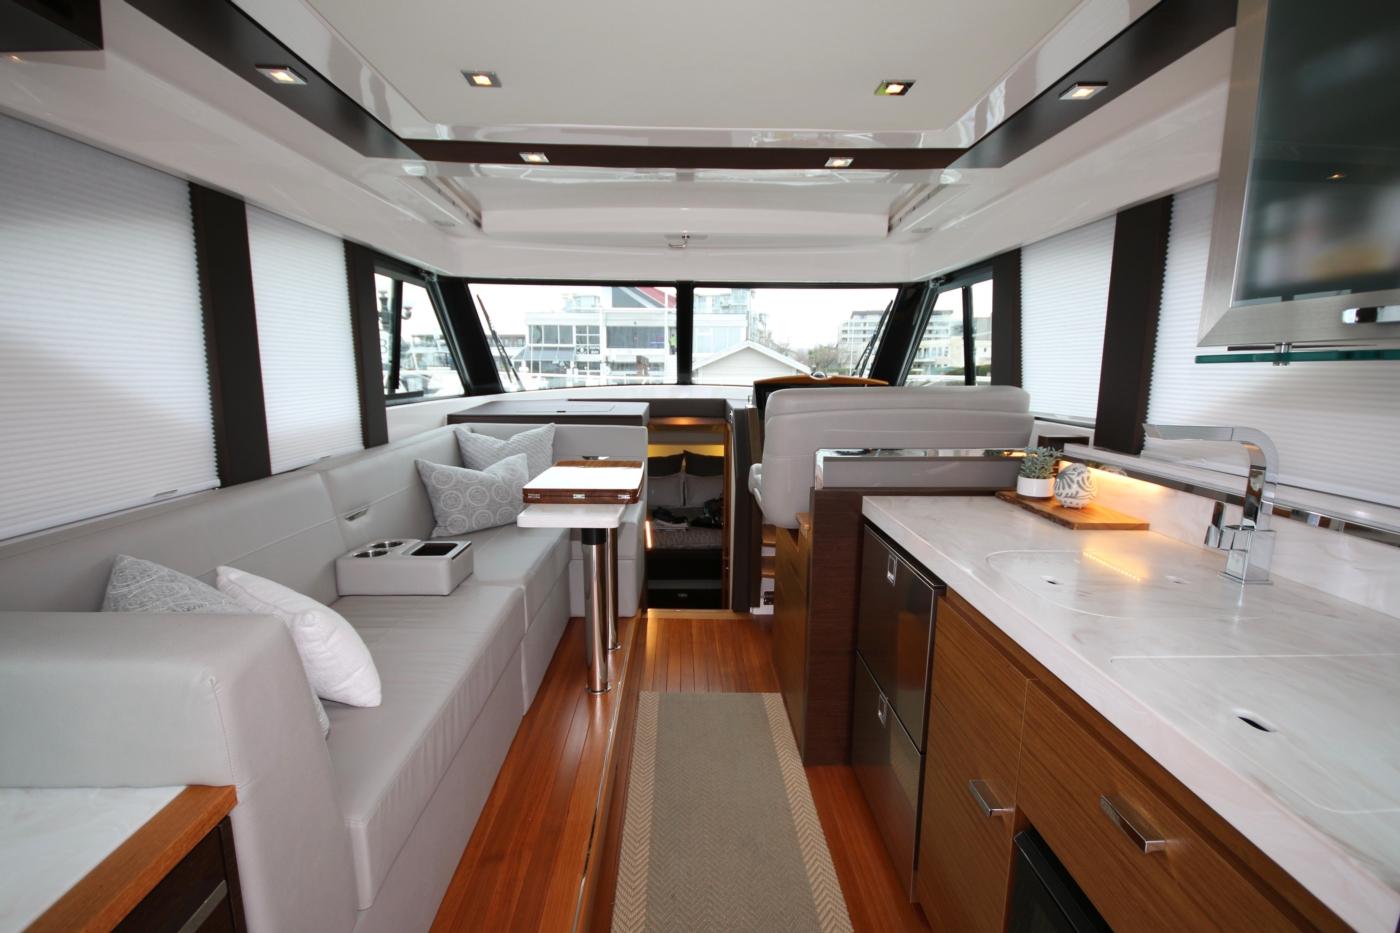 2018 Tiara Yachts 39 Coupe, Forward View